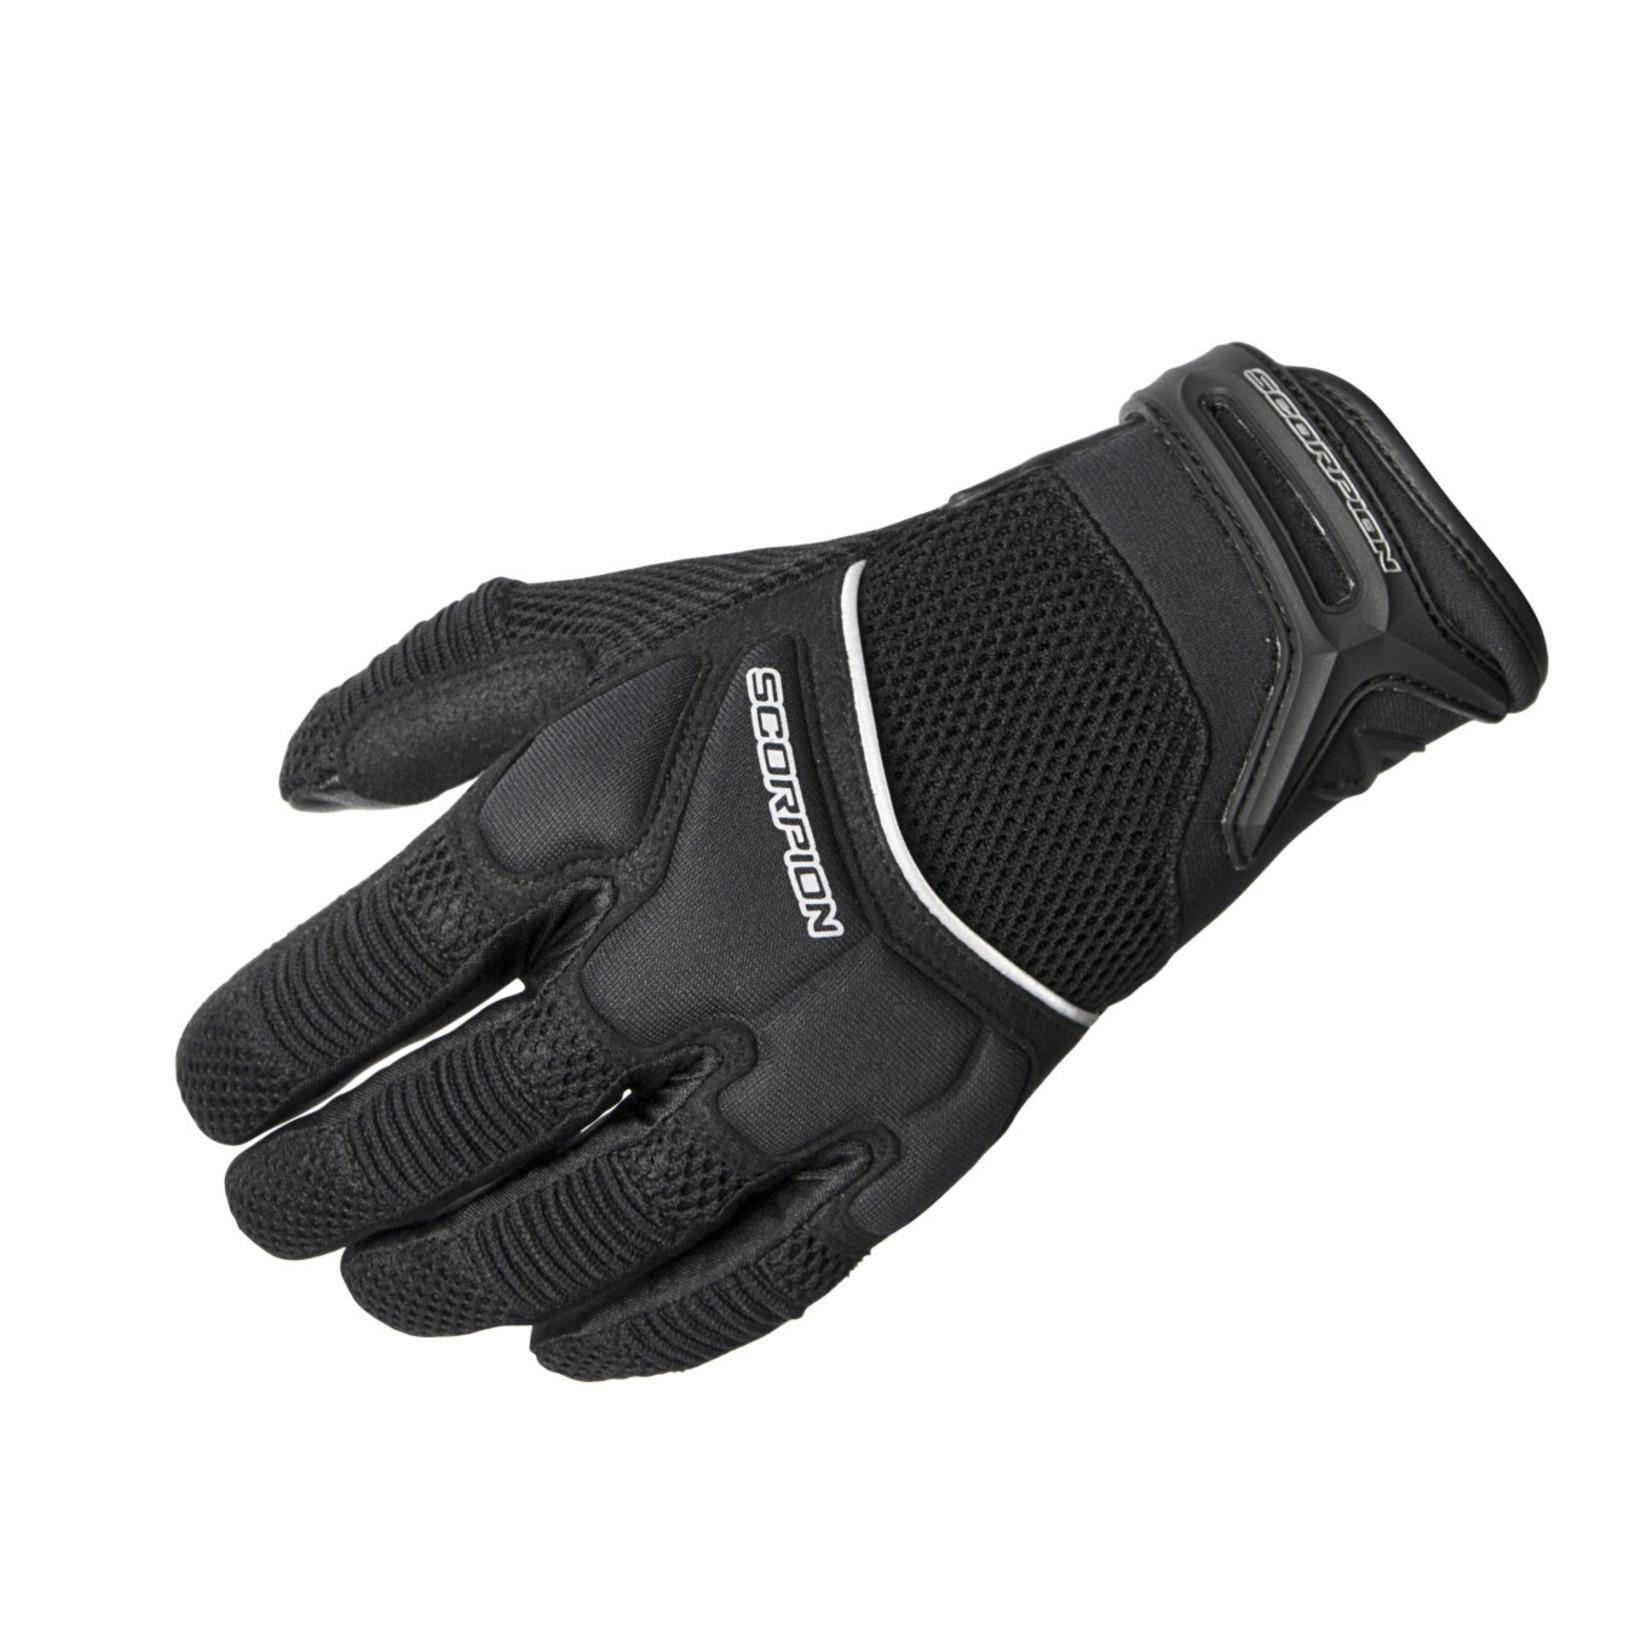 Scorpion Cool Hand II Glove Men